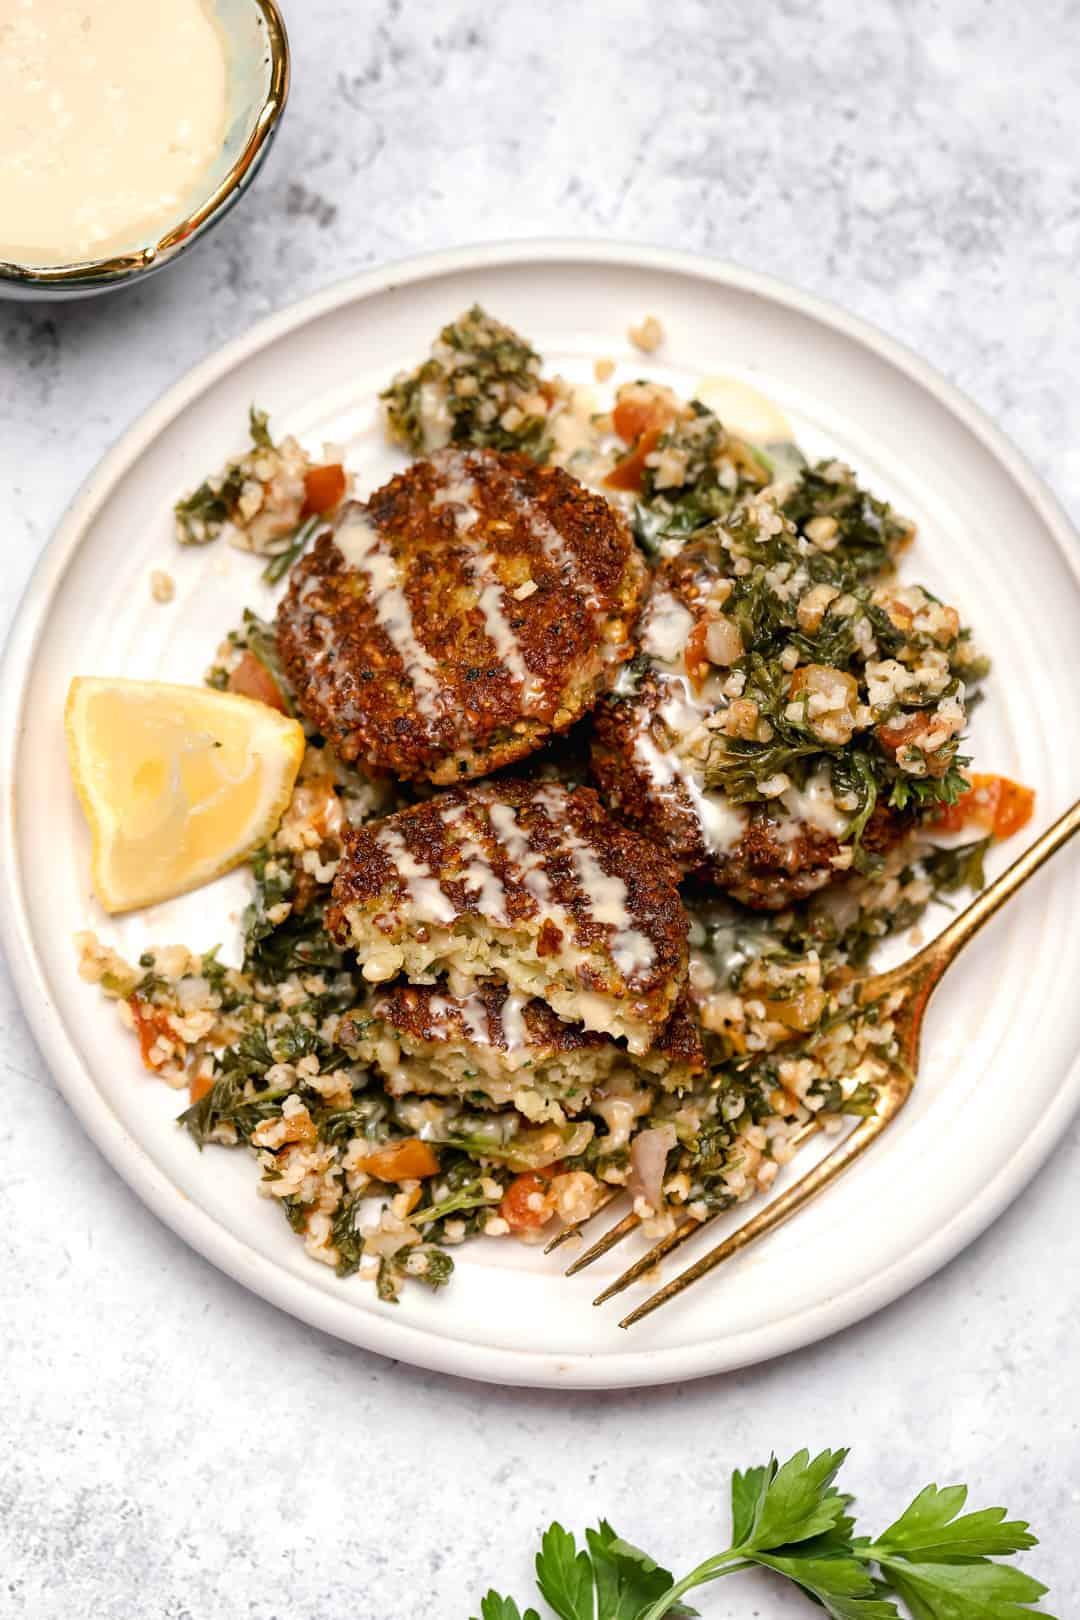 Chickpea patties with tahini and tabouli salad